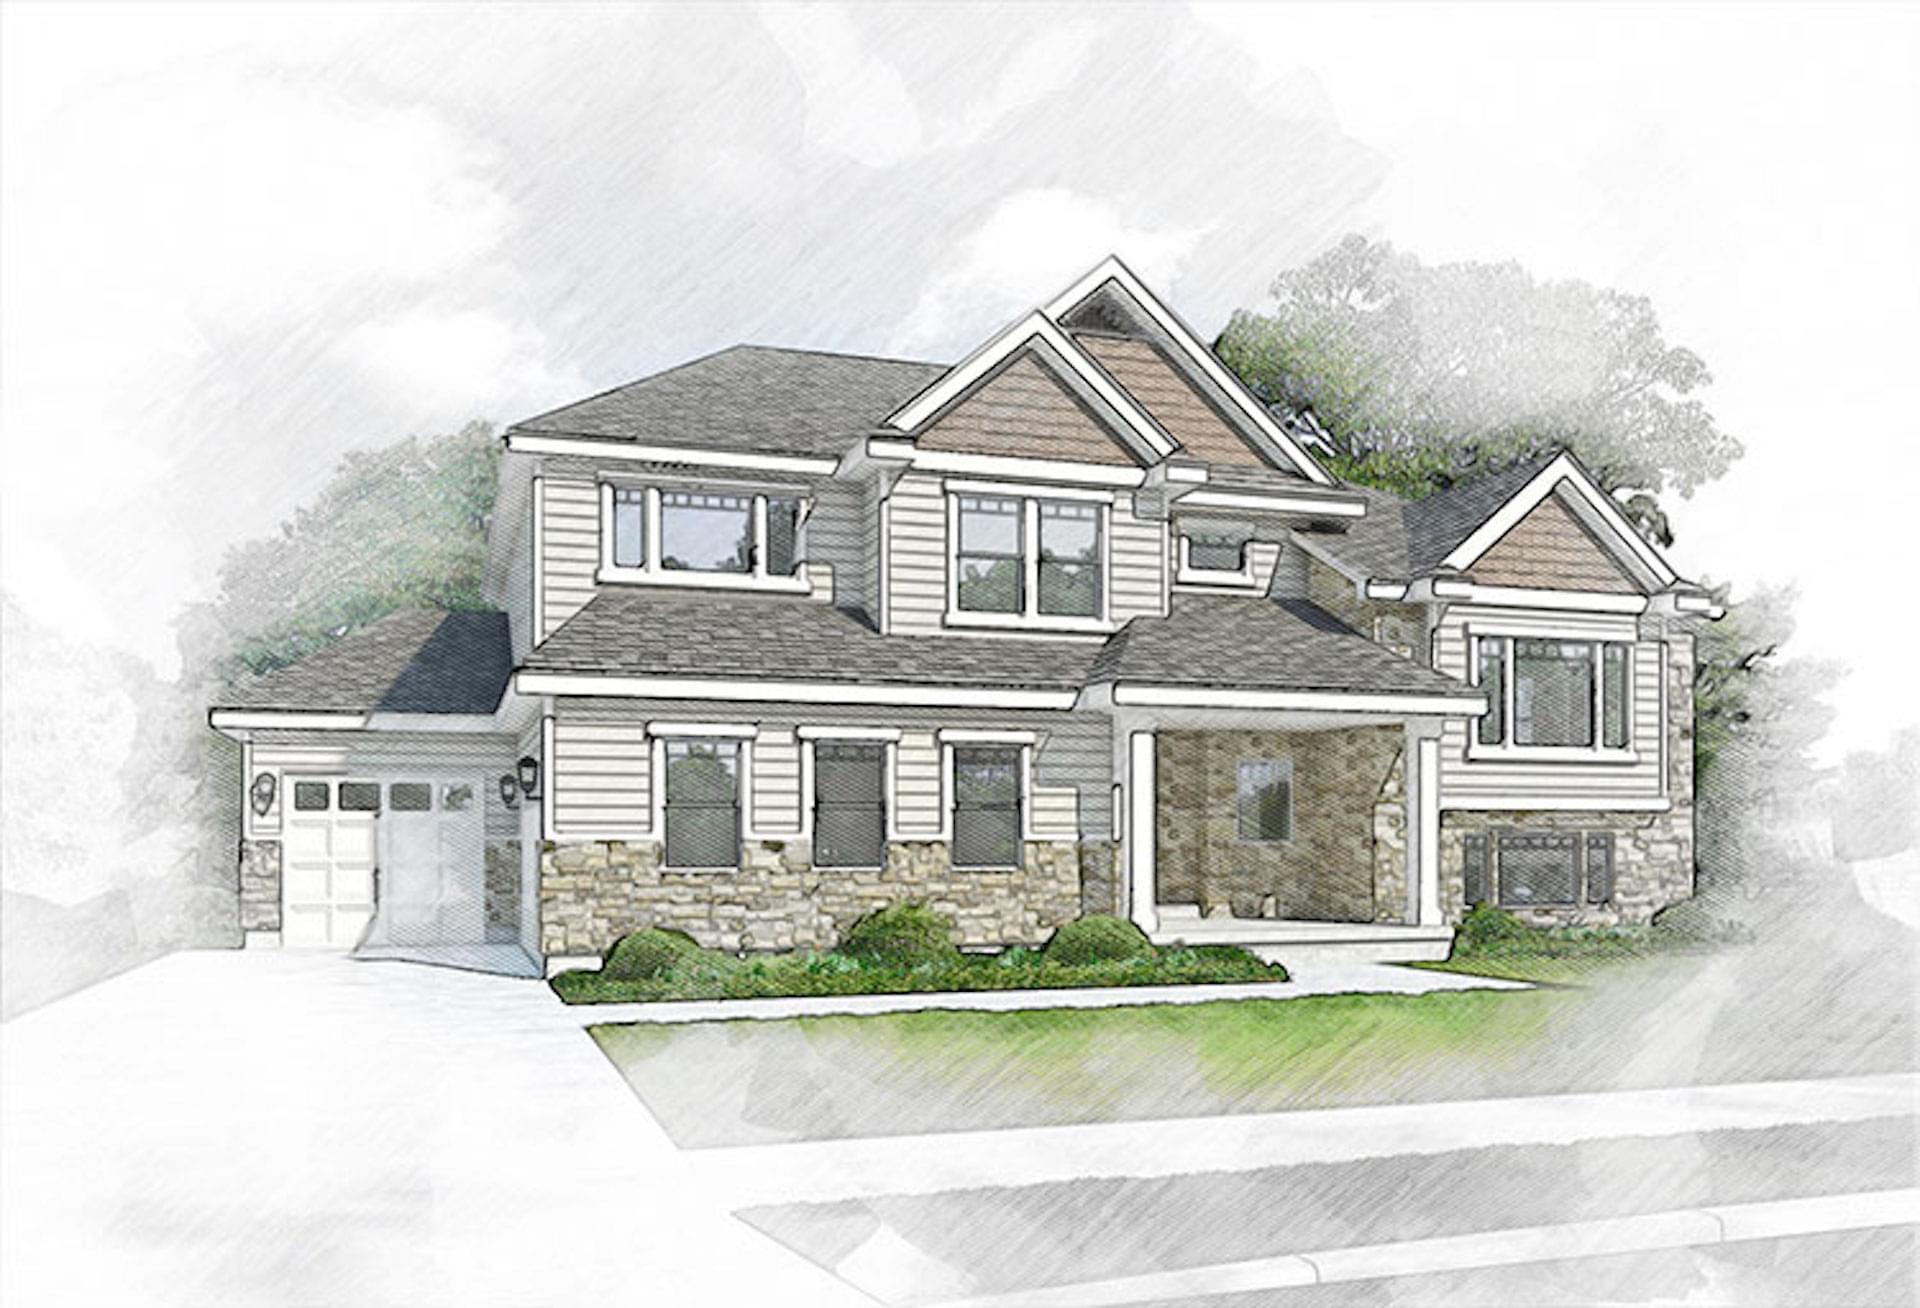 Promontory new home in Lehi, UT